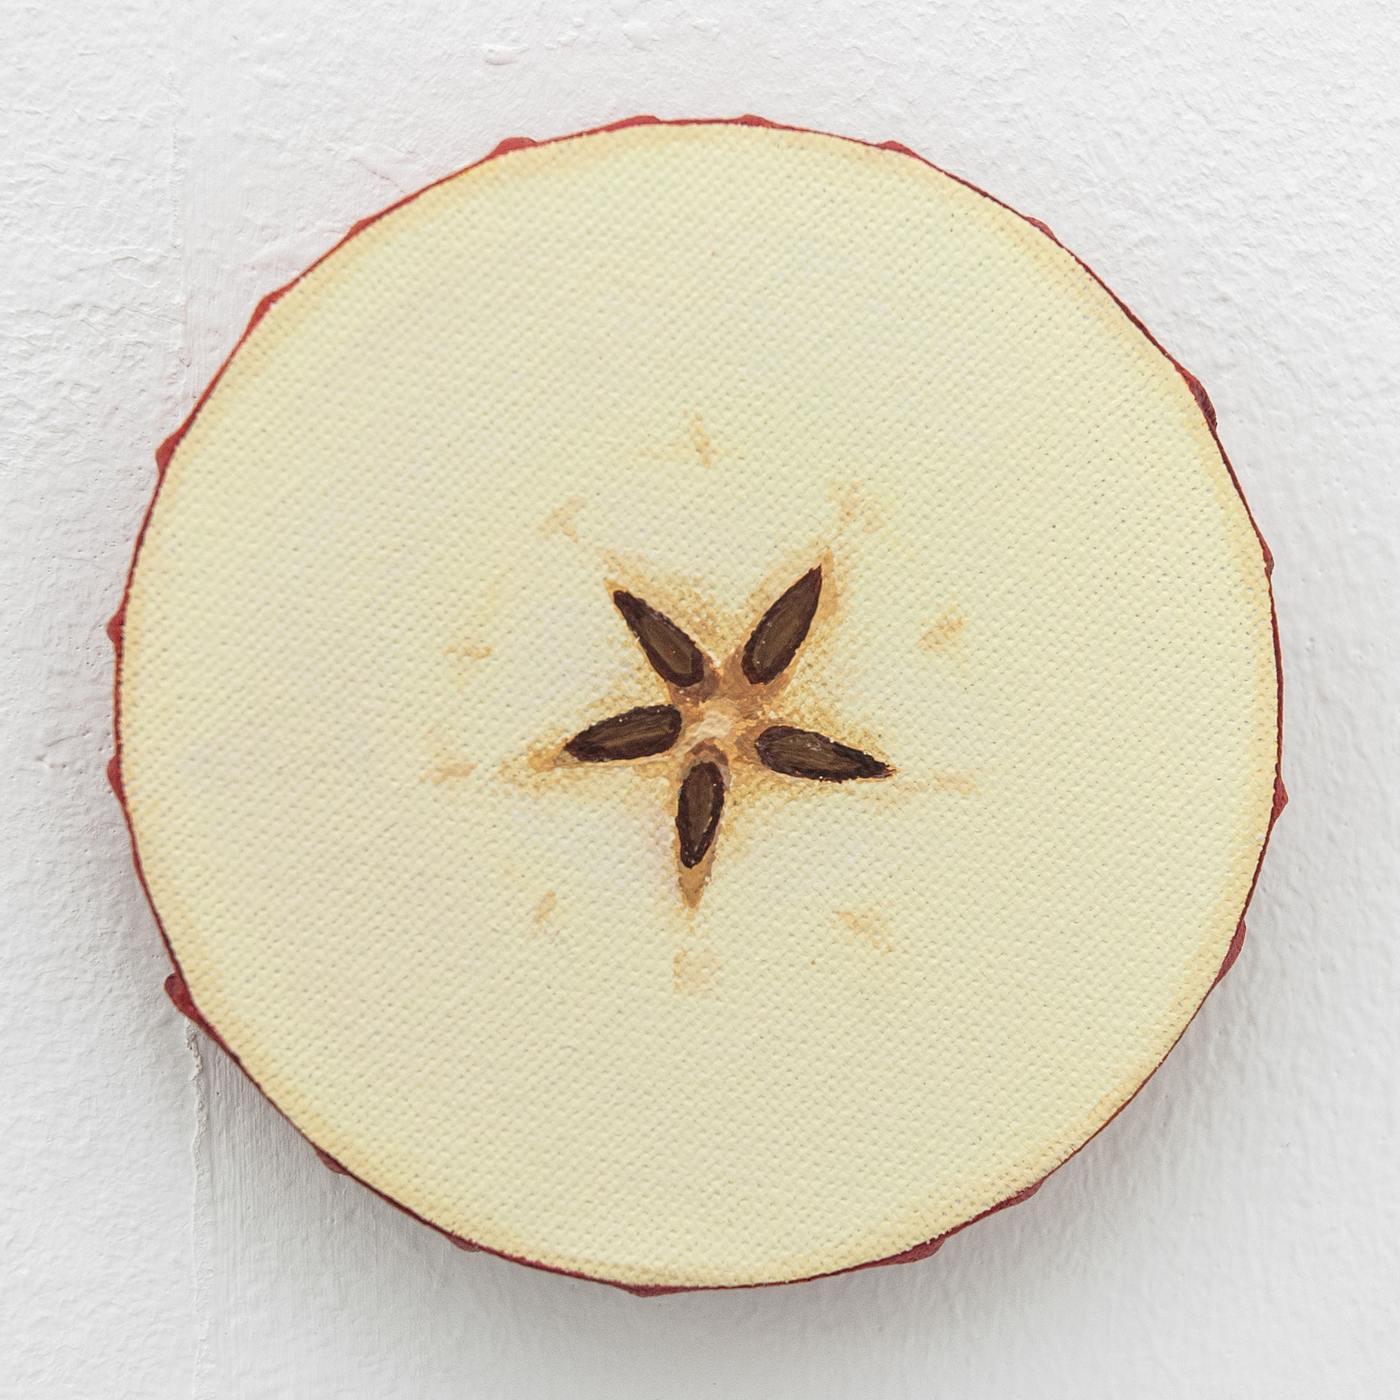 11.Apple